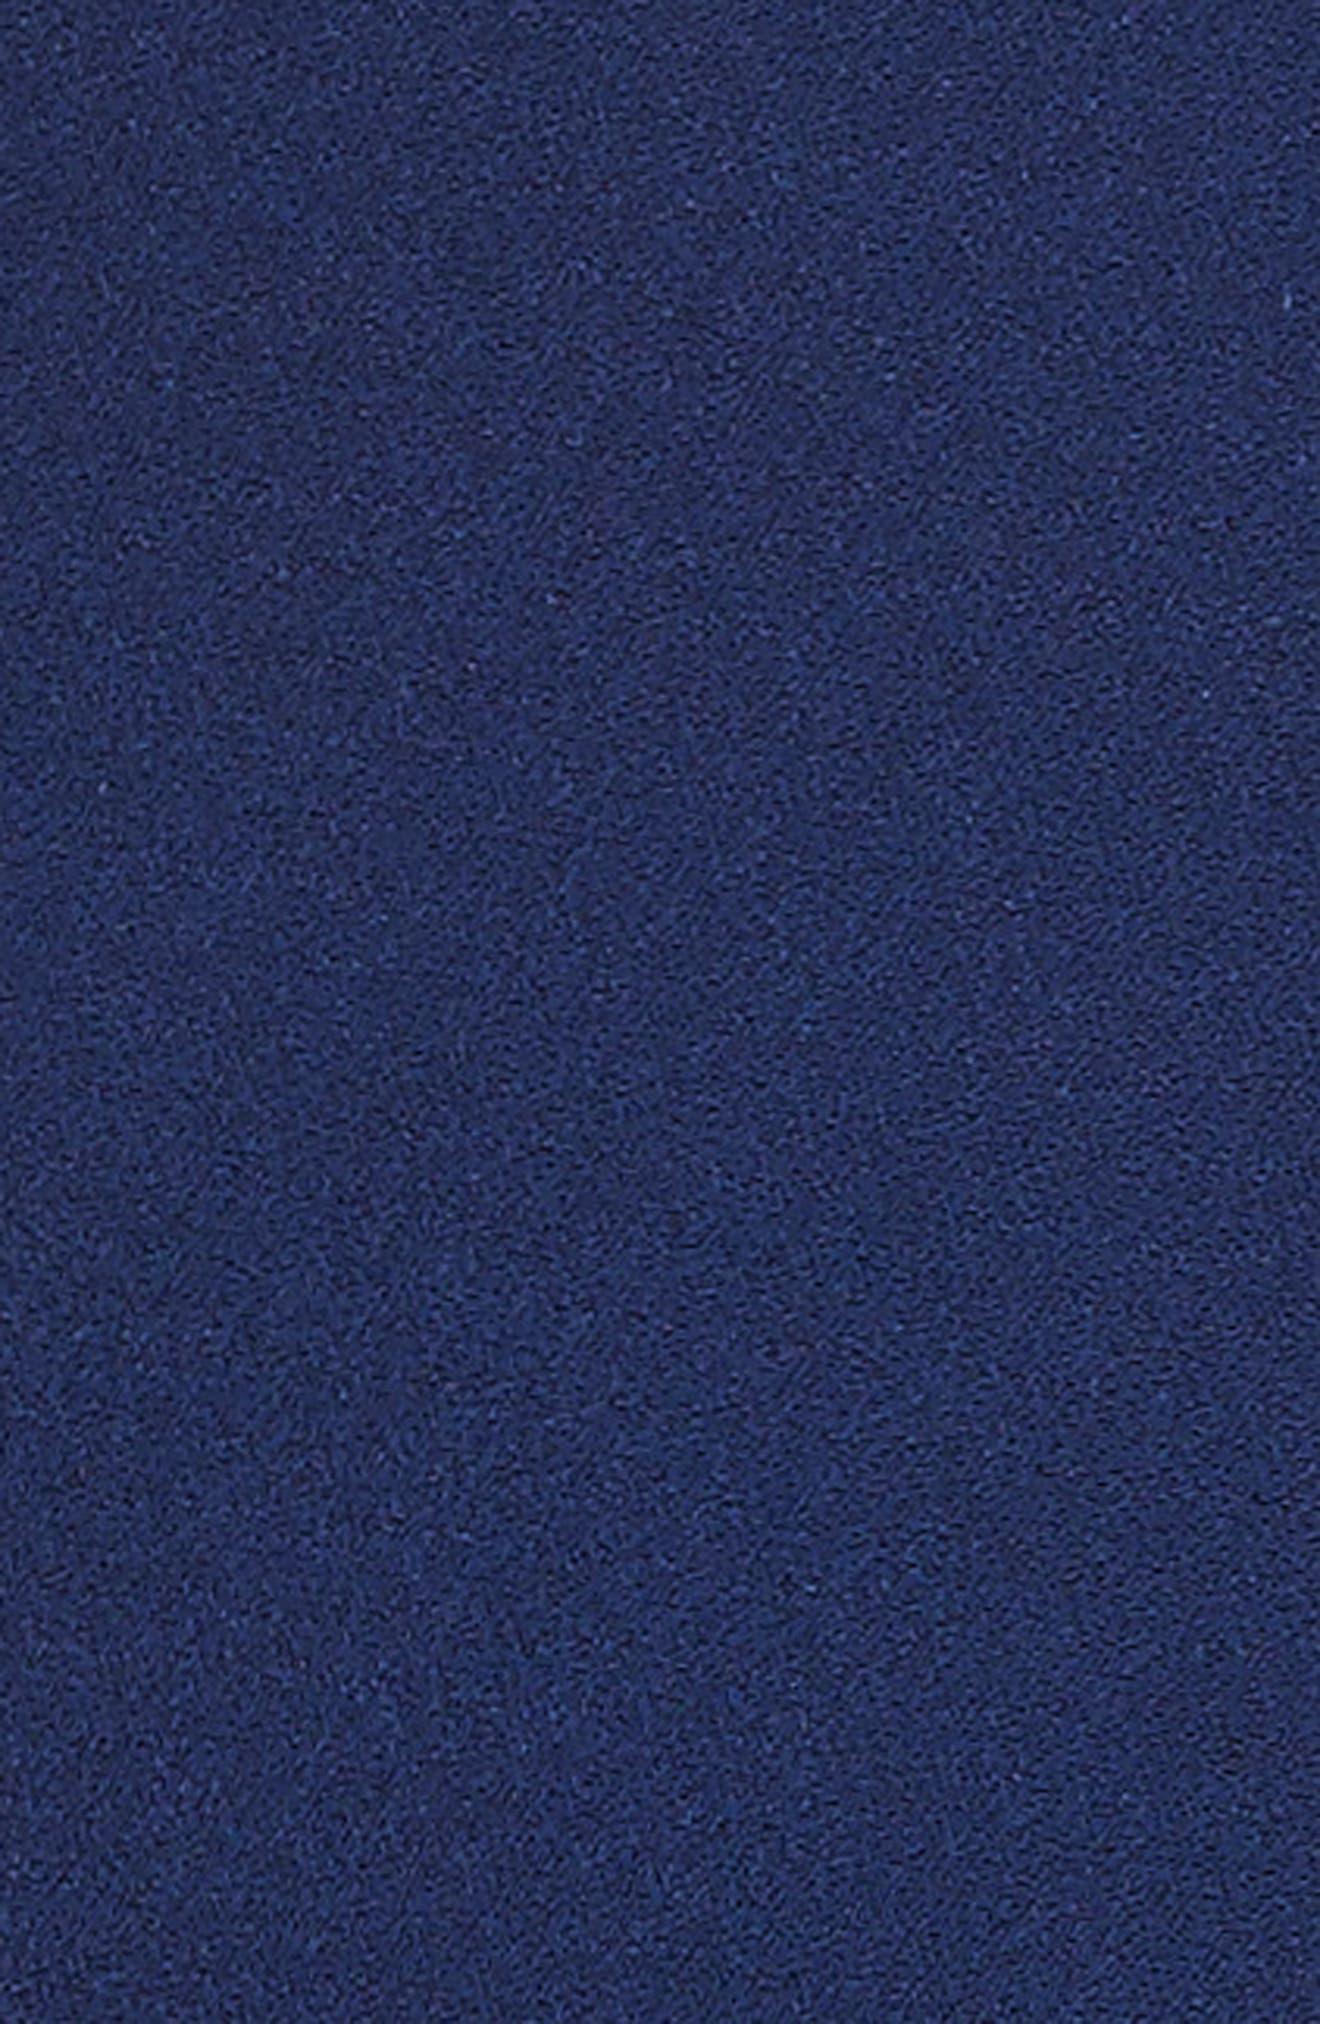 Drawstring Cady Jumpsuit,                             Alternate thumbnail 6, color,                             Sapphire Blue